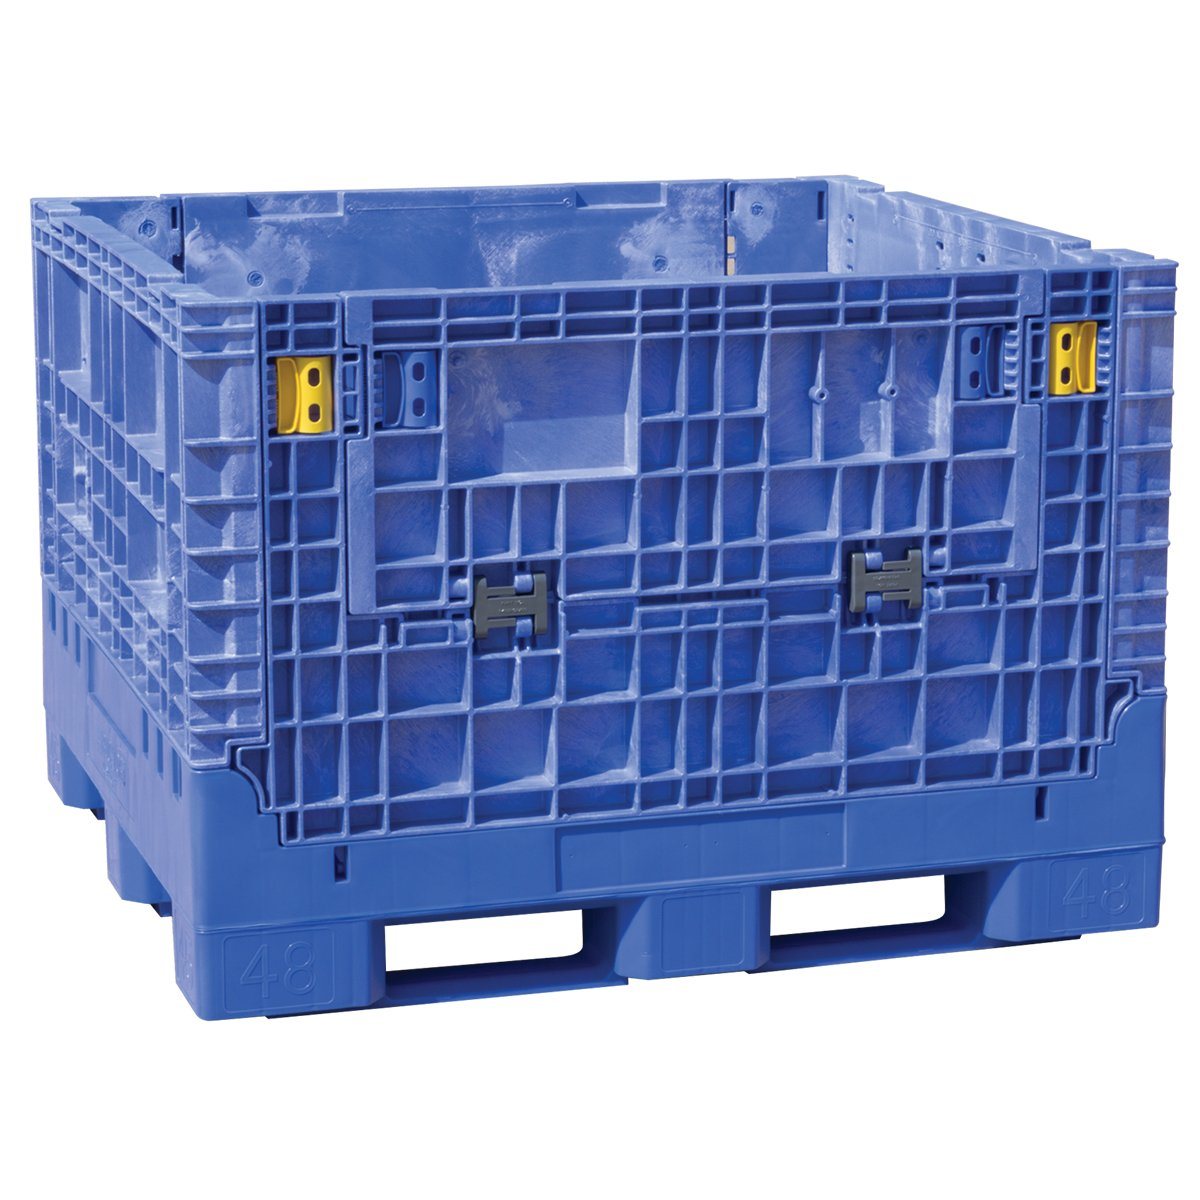 Buckhorn BN4845342023000 Extra-Duty 48'' x 45'' x 34'' Collapsible Bulk Box, Blue